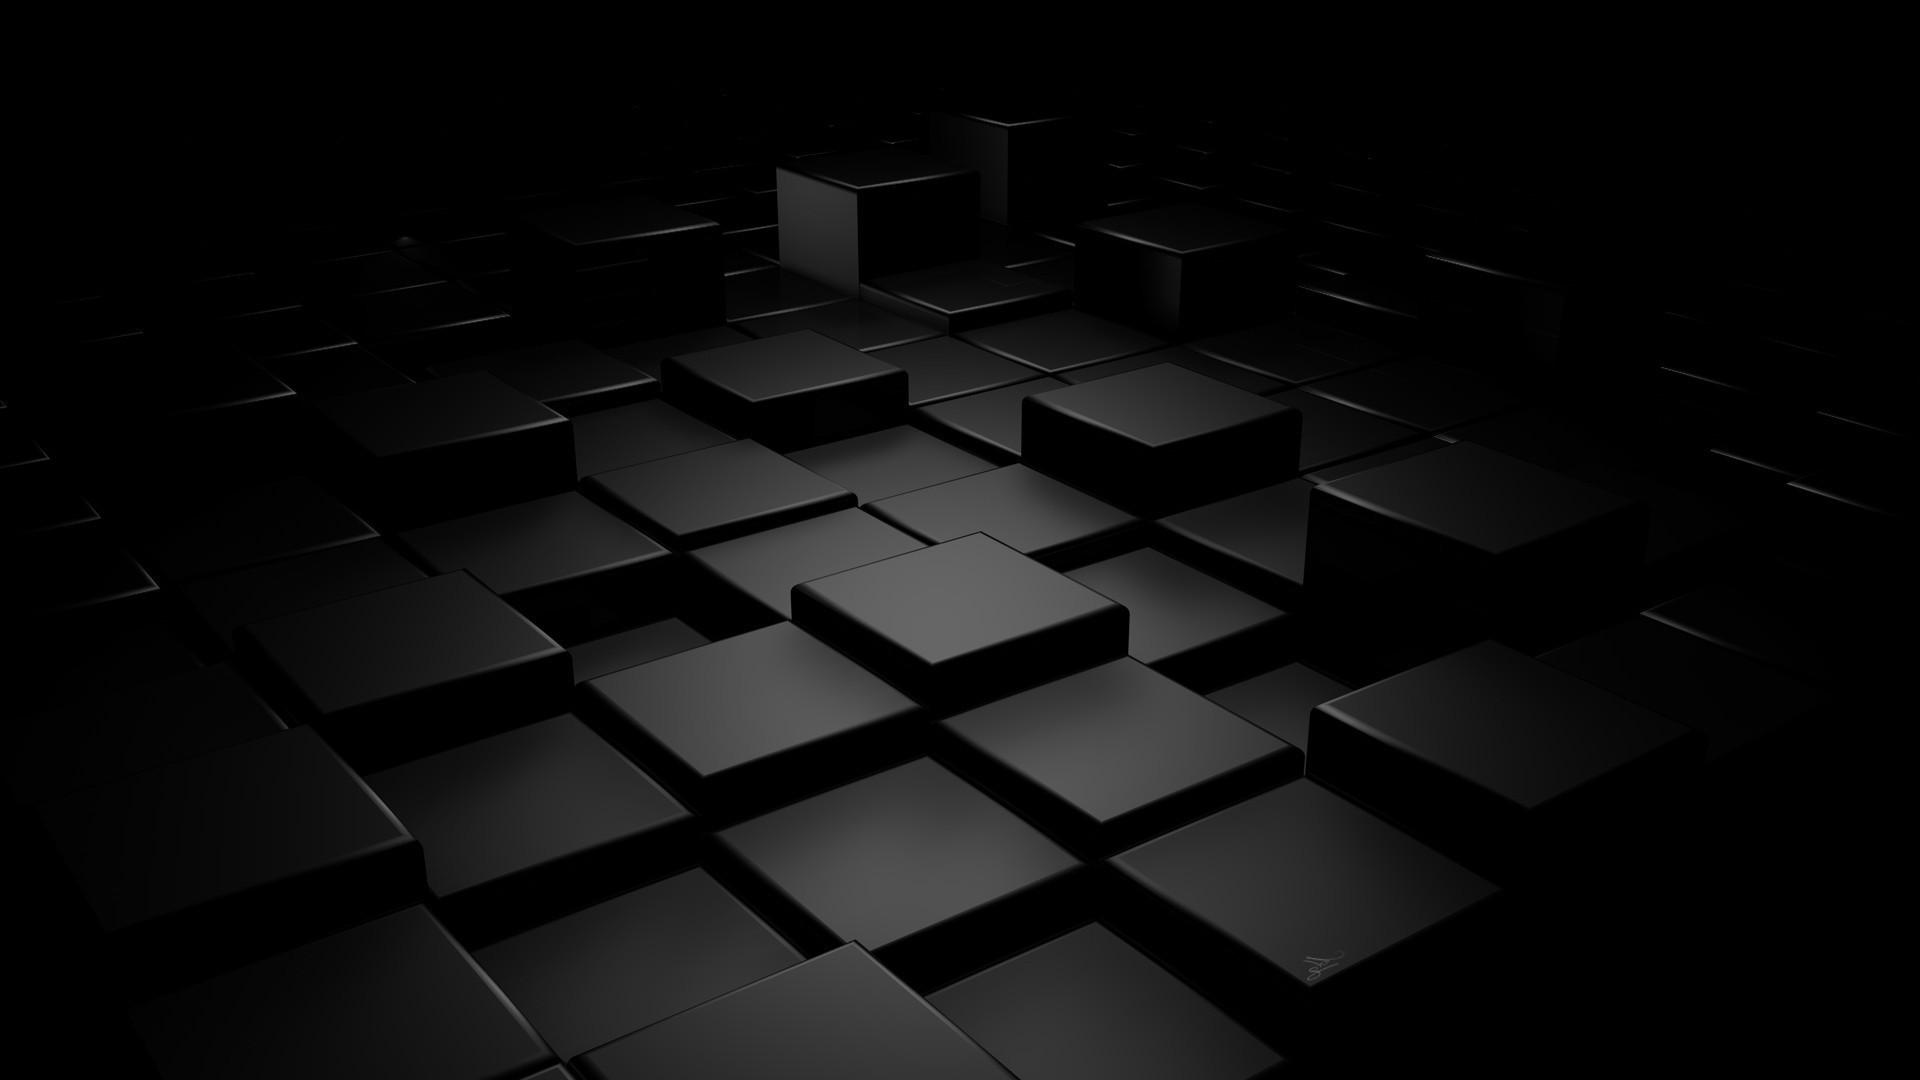 2014-10-Black-Wallpaper-25